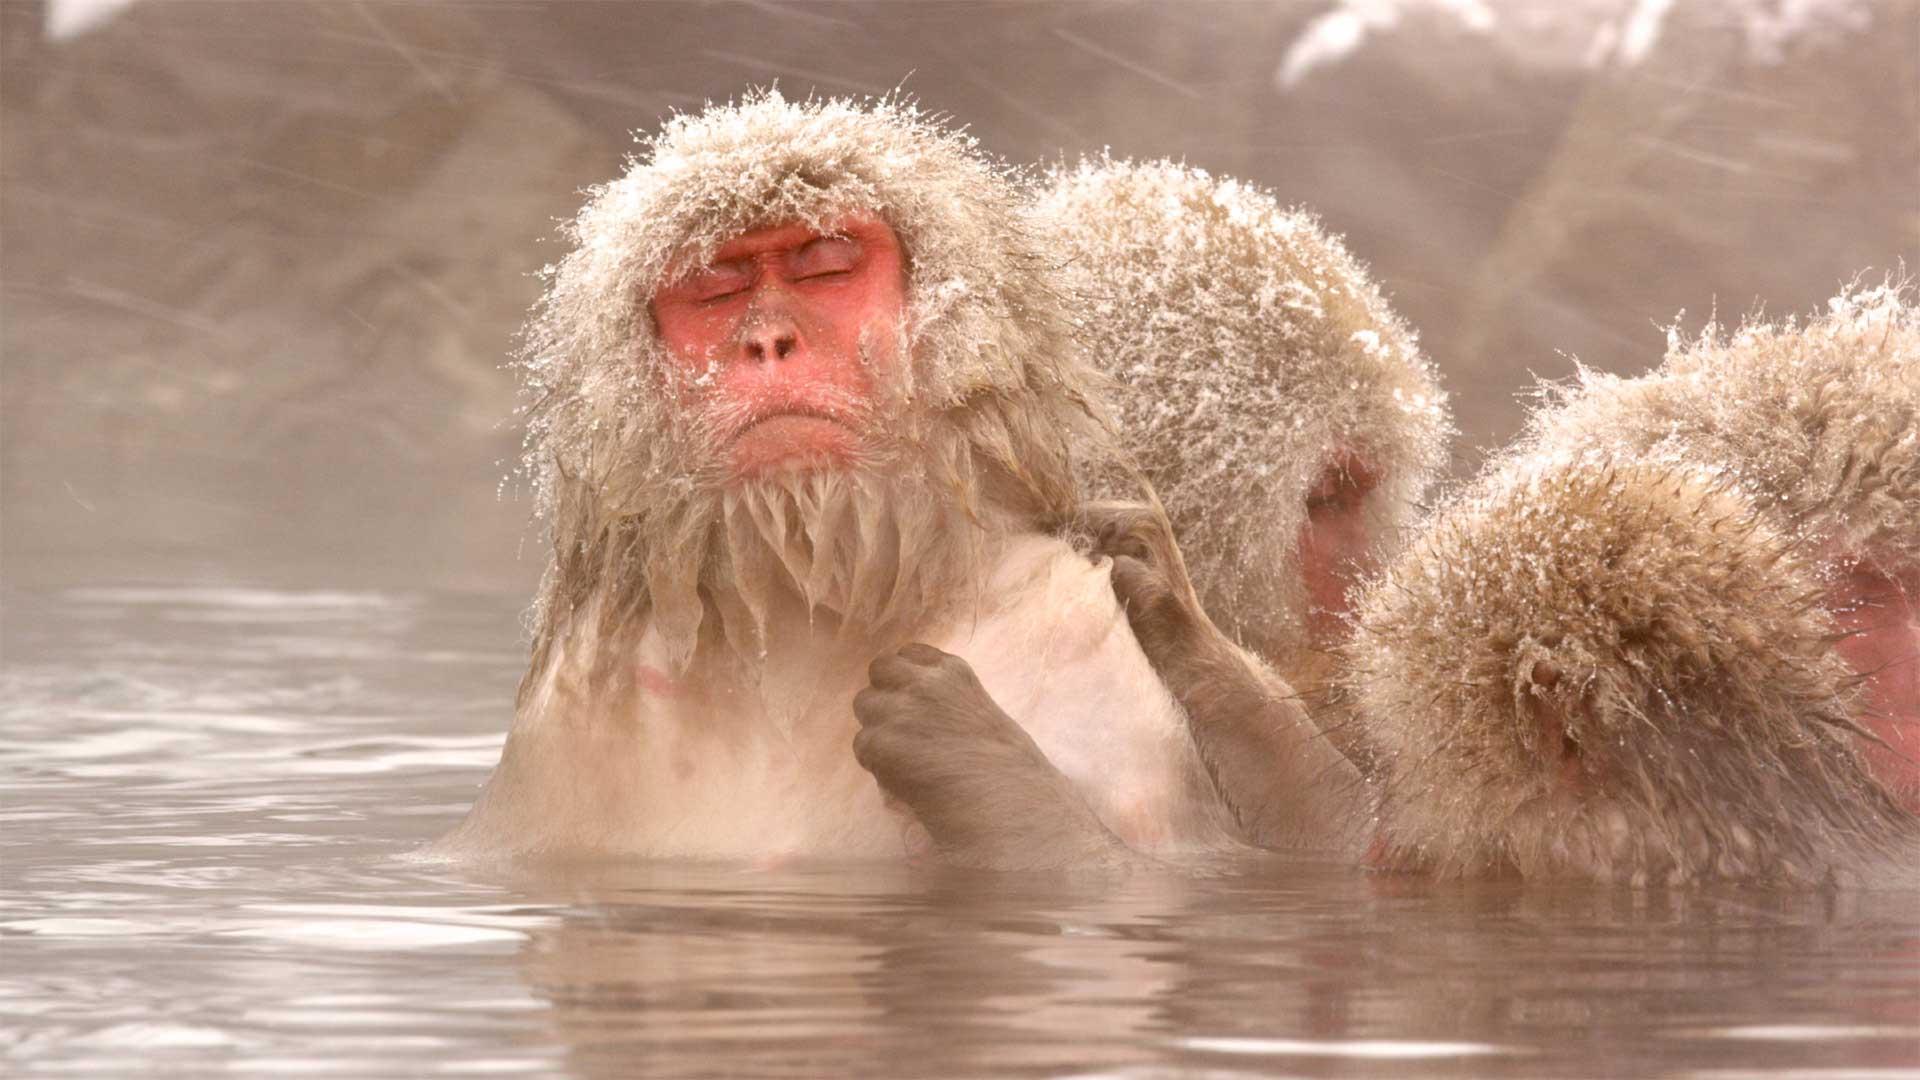 nature_snow-monkeys_hot_springs_hero